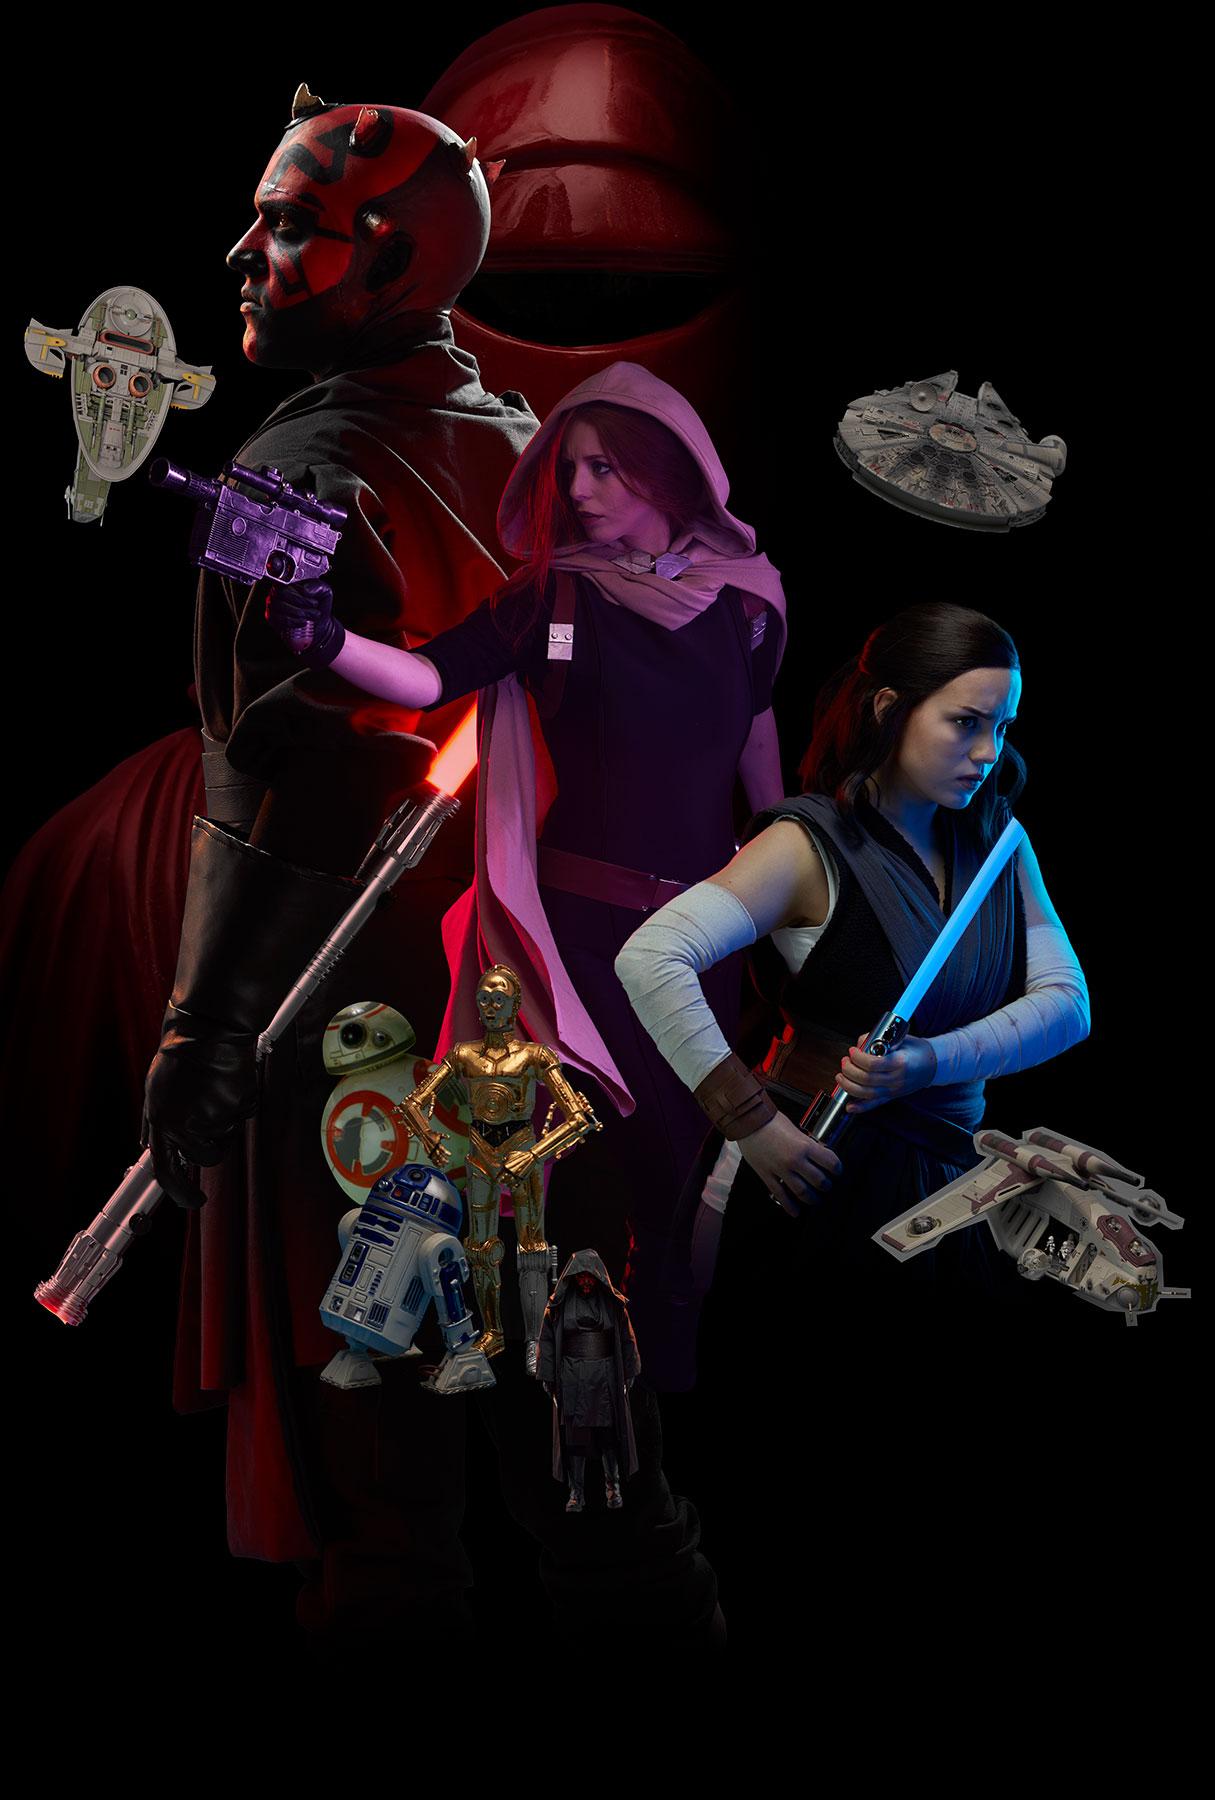 Sayanoff Arthur Star Wars Poster 02 02